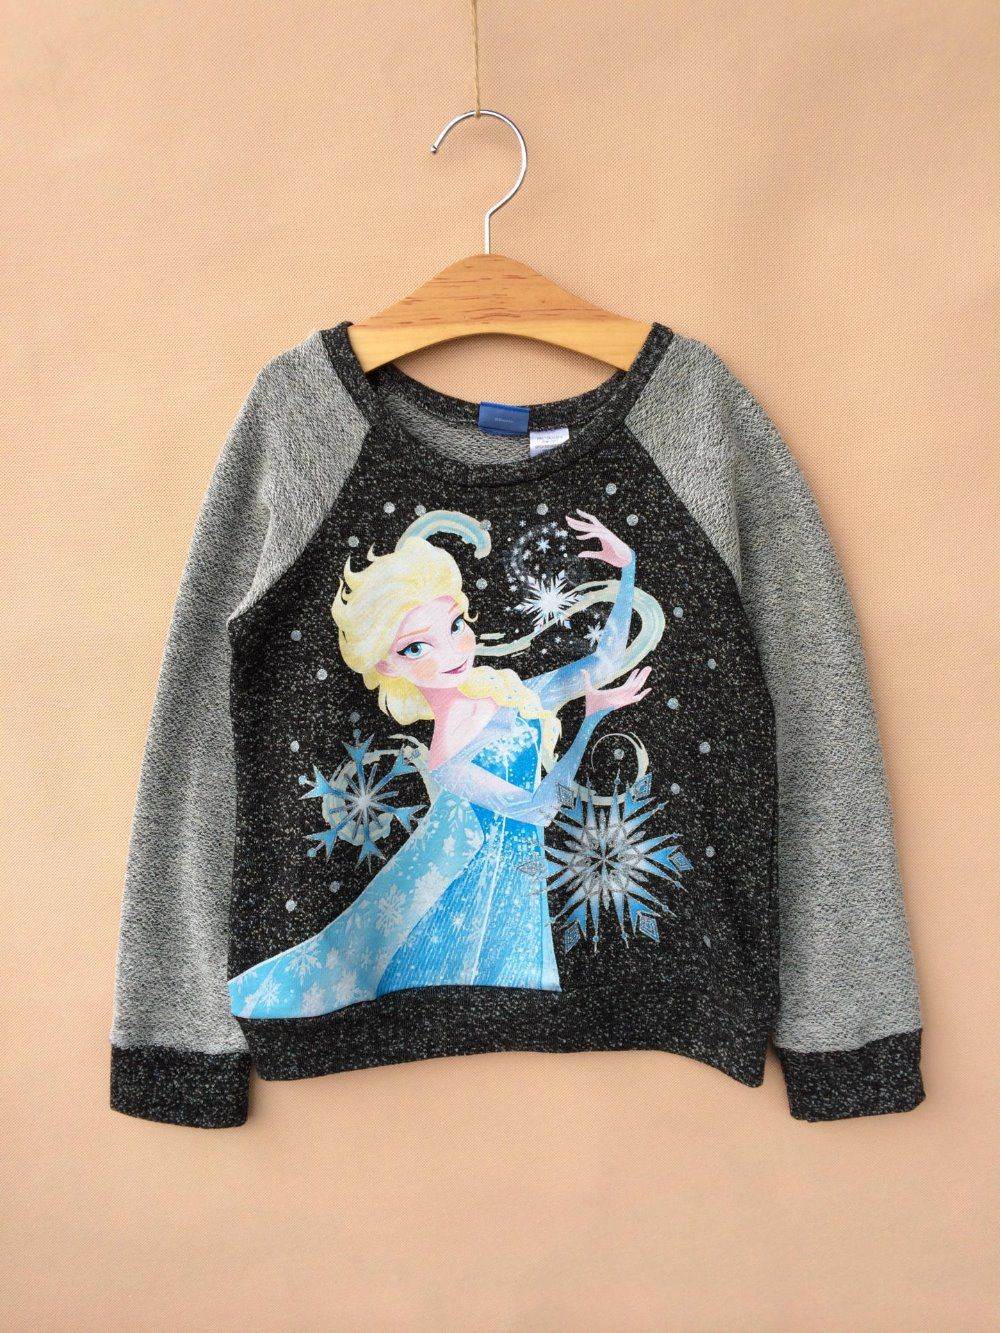 Free shipping  children clothing boys frozen ELSA  long sleeves t shirt top tops cotton shirts apparel US $63.00